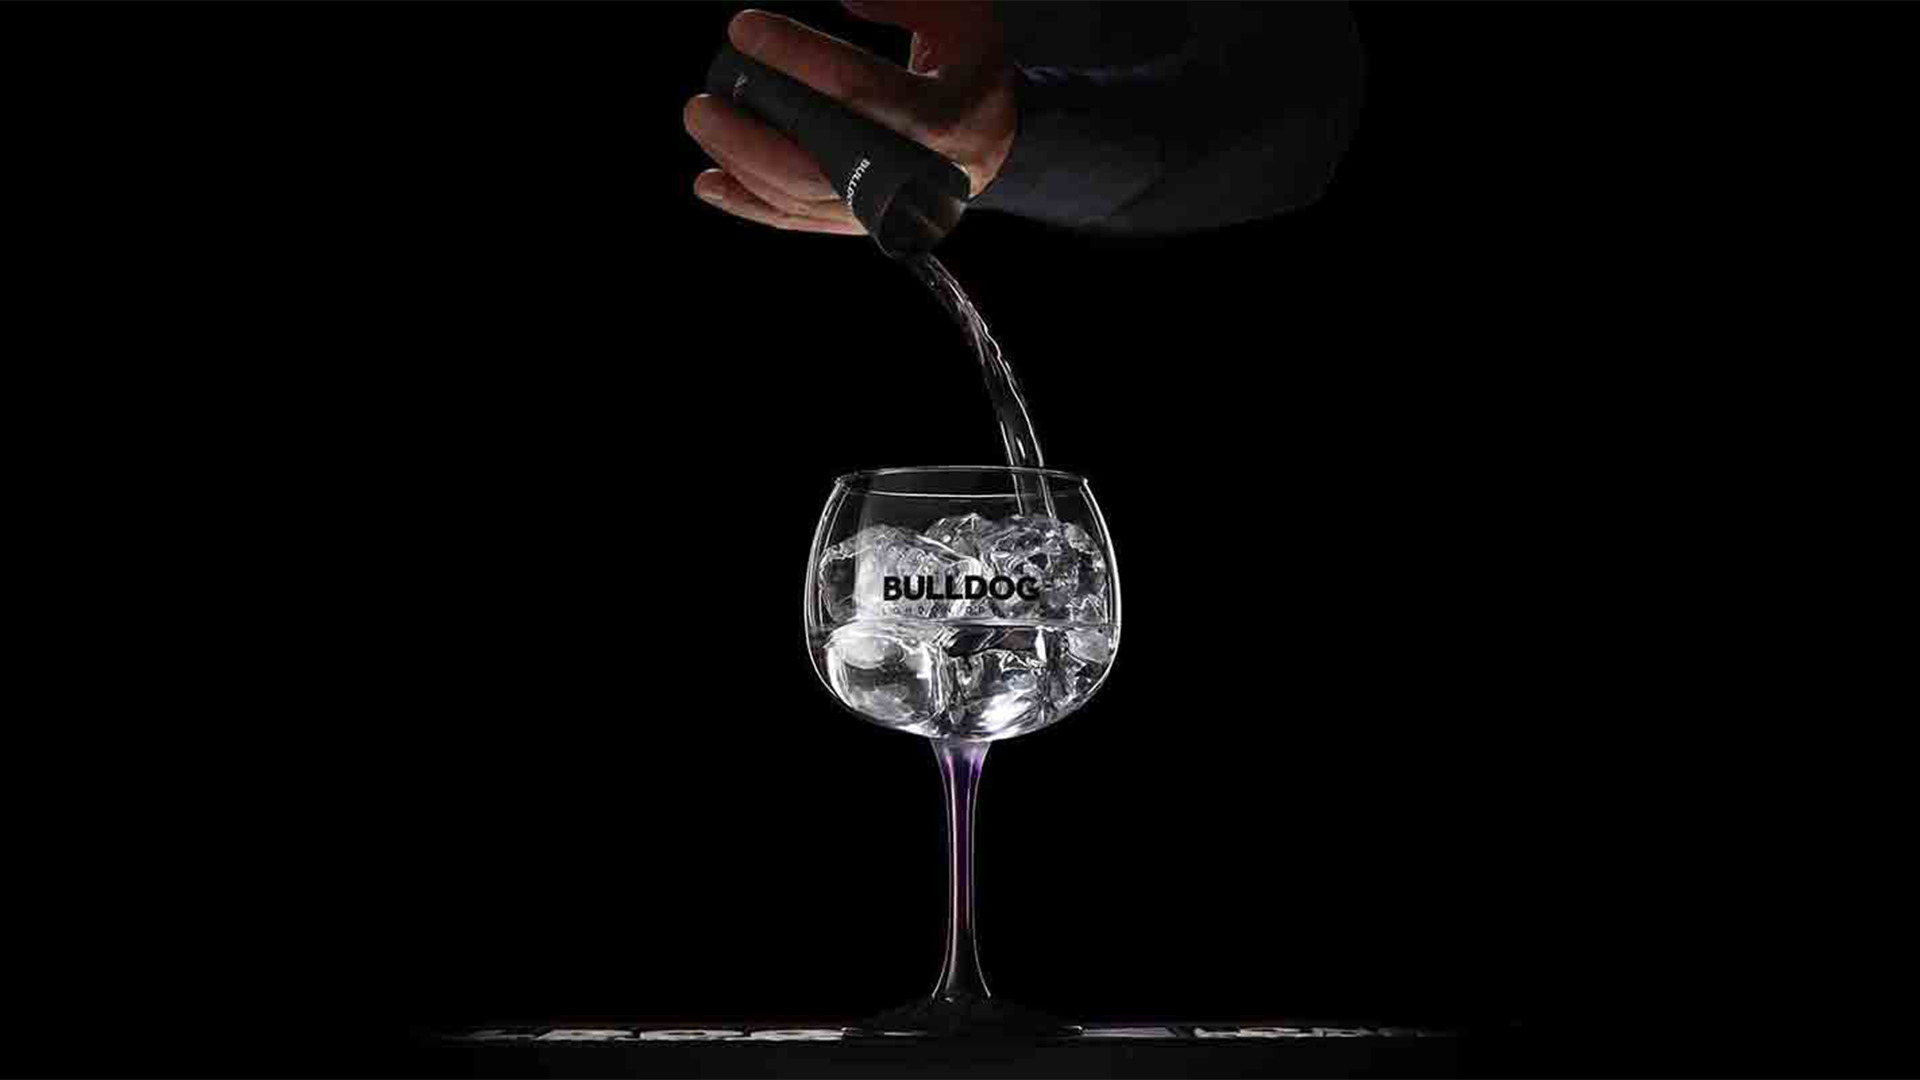 Rượu Bulldog Gin